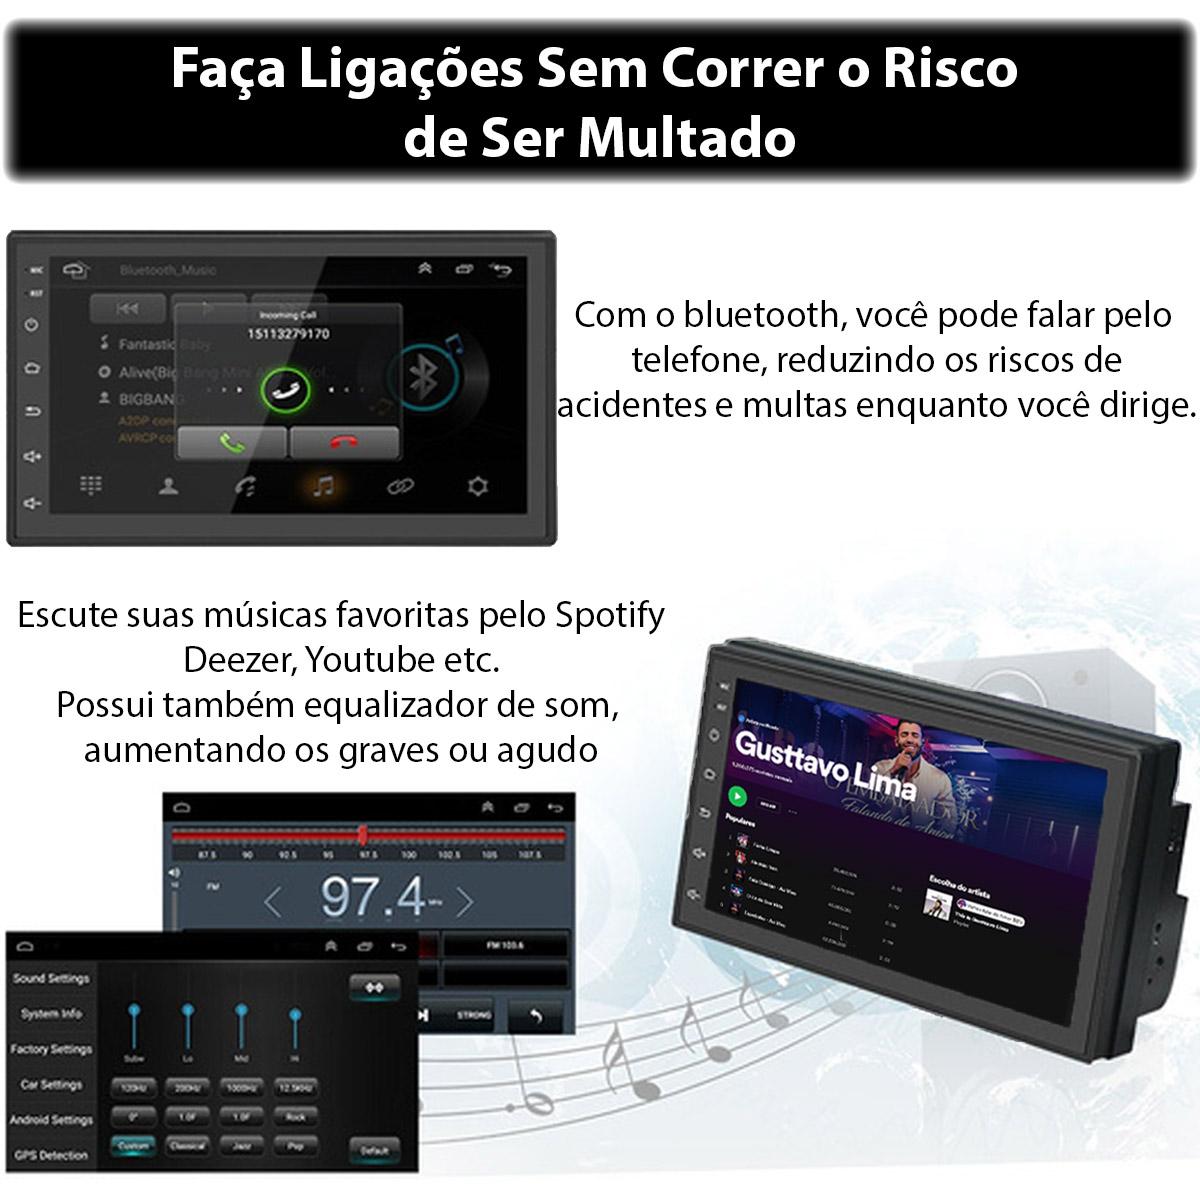 Central Multimidia com Moldura Volkswagen Gol G3 Mp5 Bluetooth Usb Touchscreen 7 Polegadas 2 Din Atacado